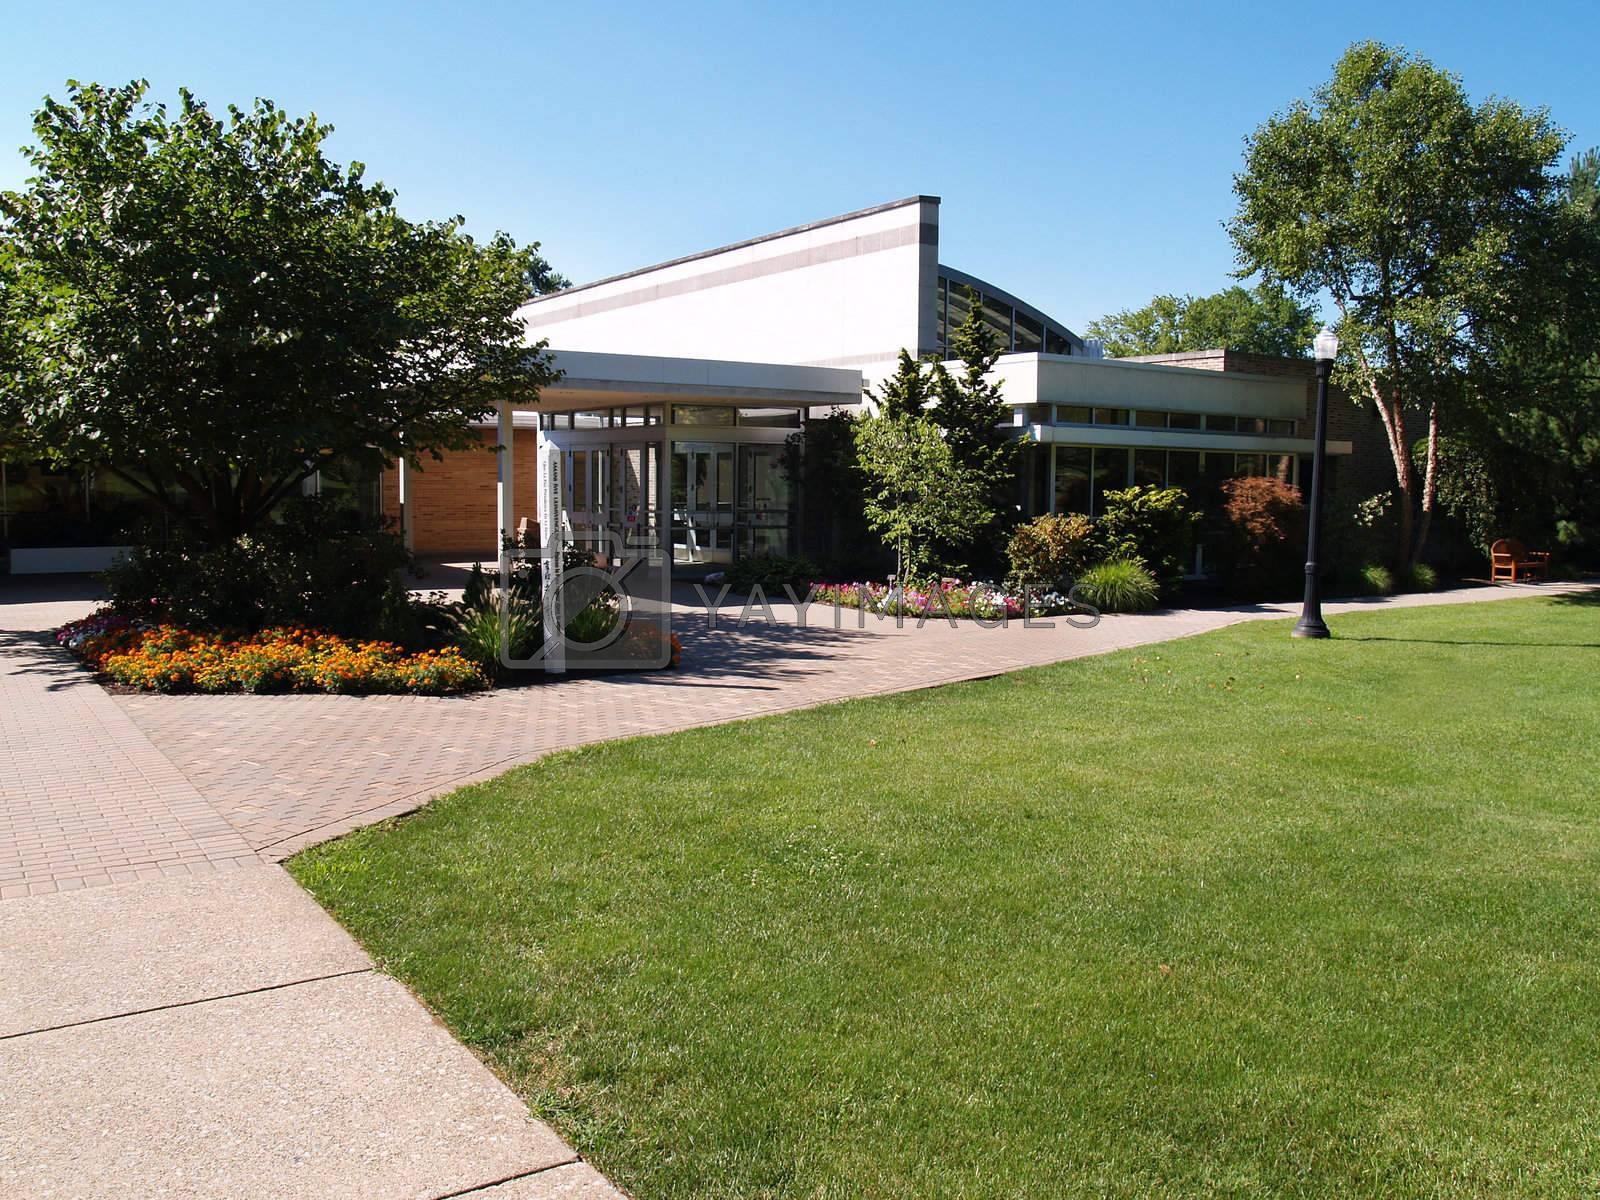 Royalty free image of Lees Hall, Cedar Crest College by cfarmer